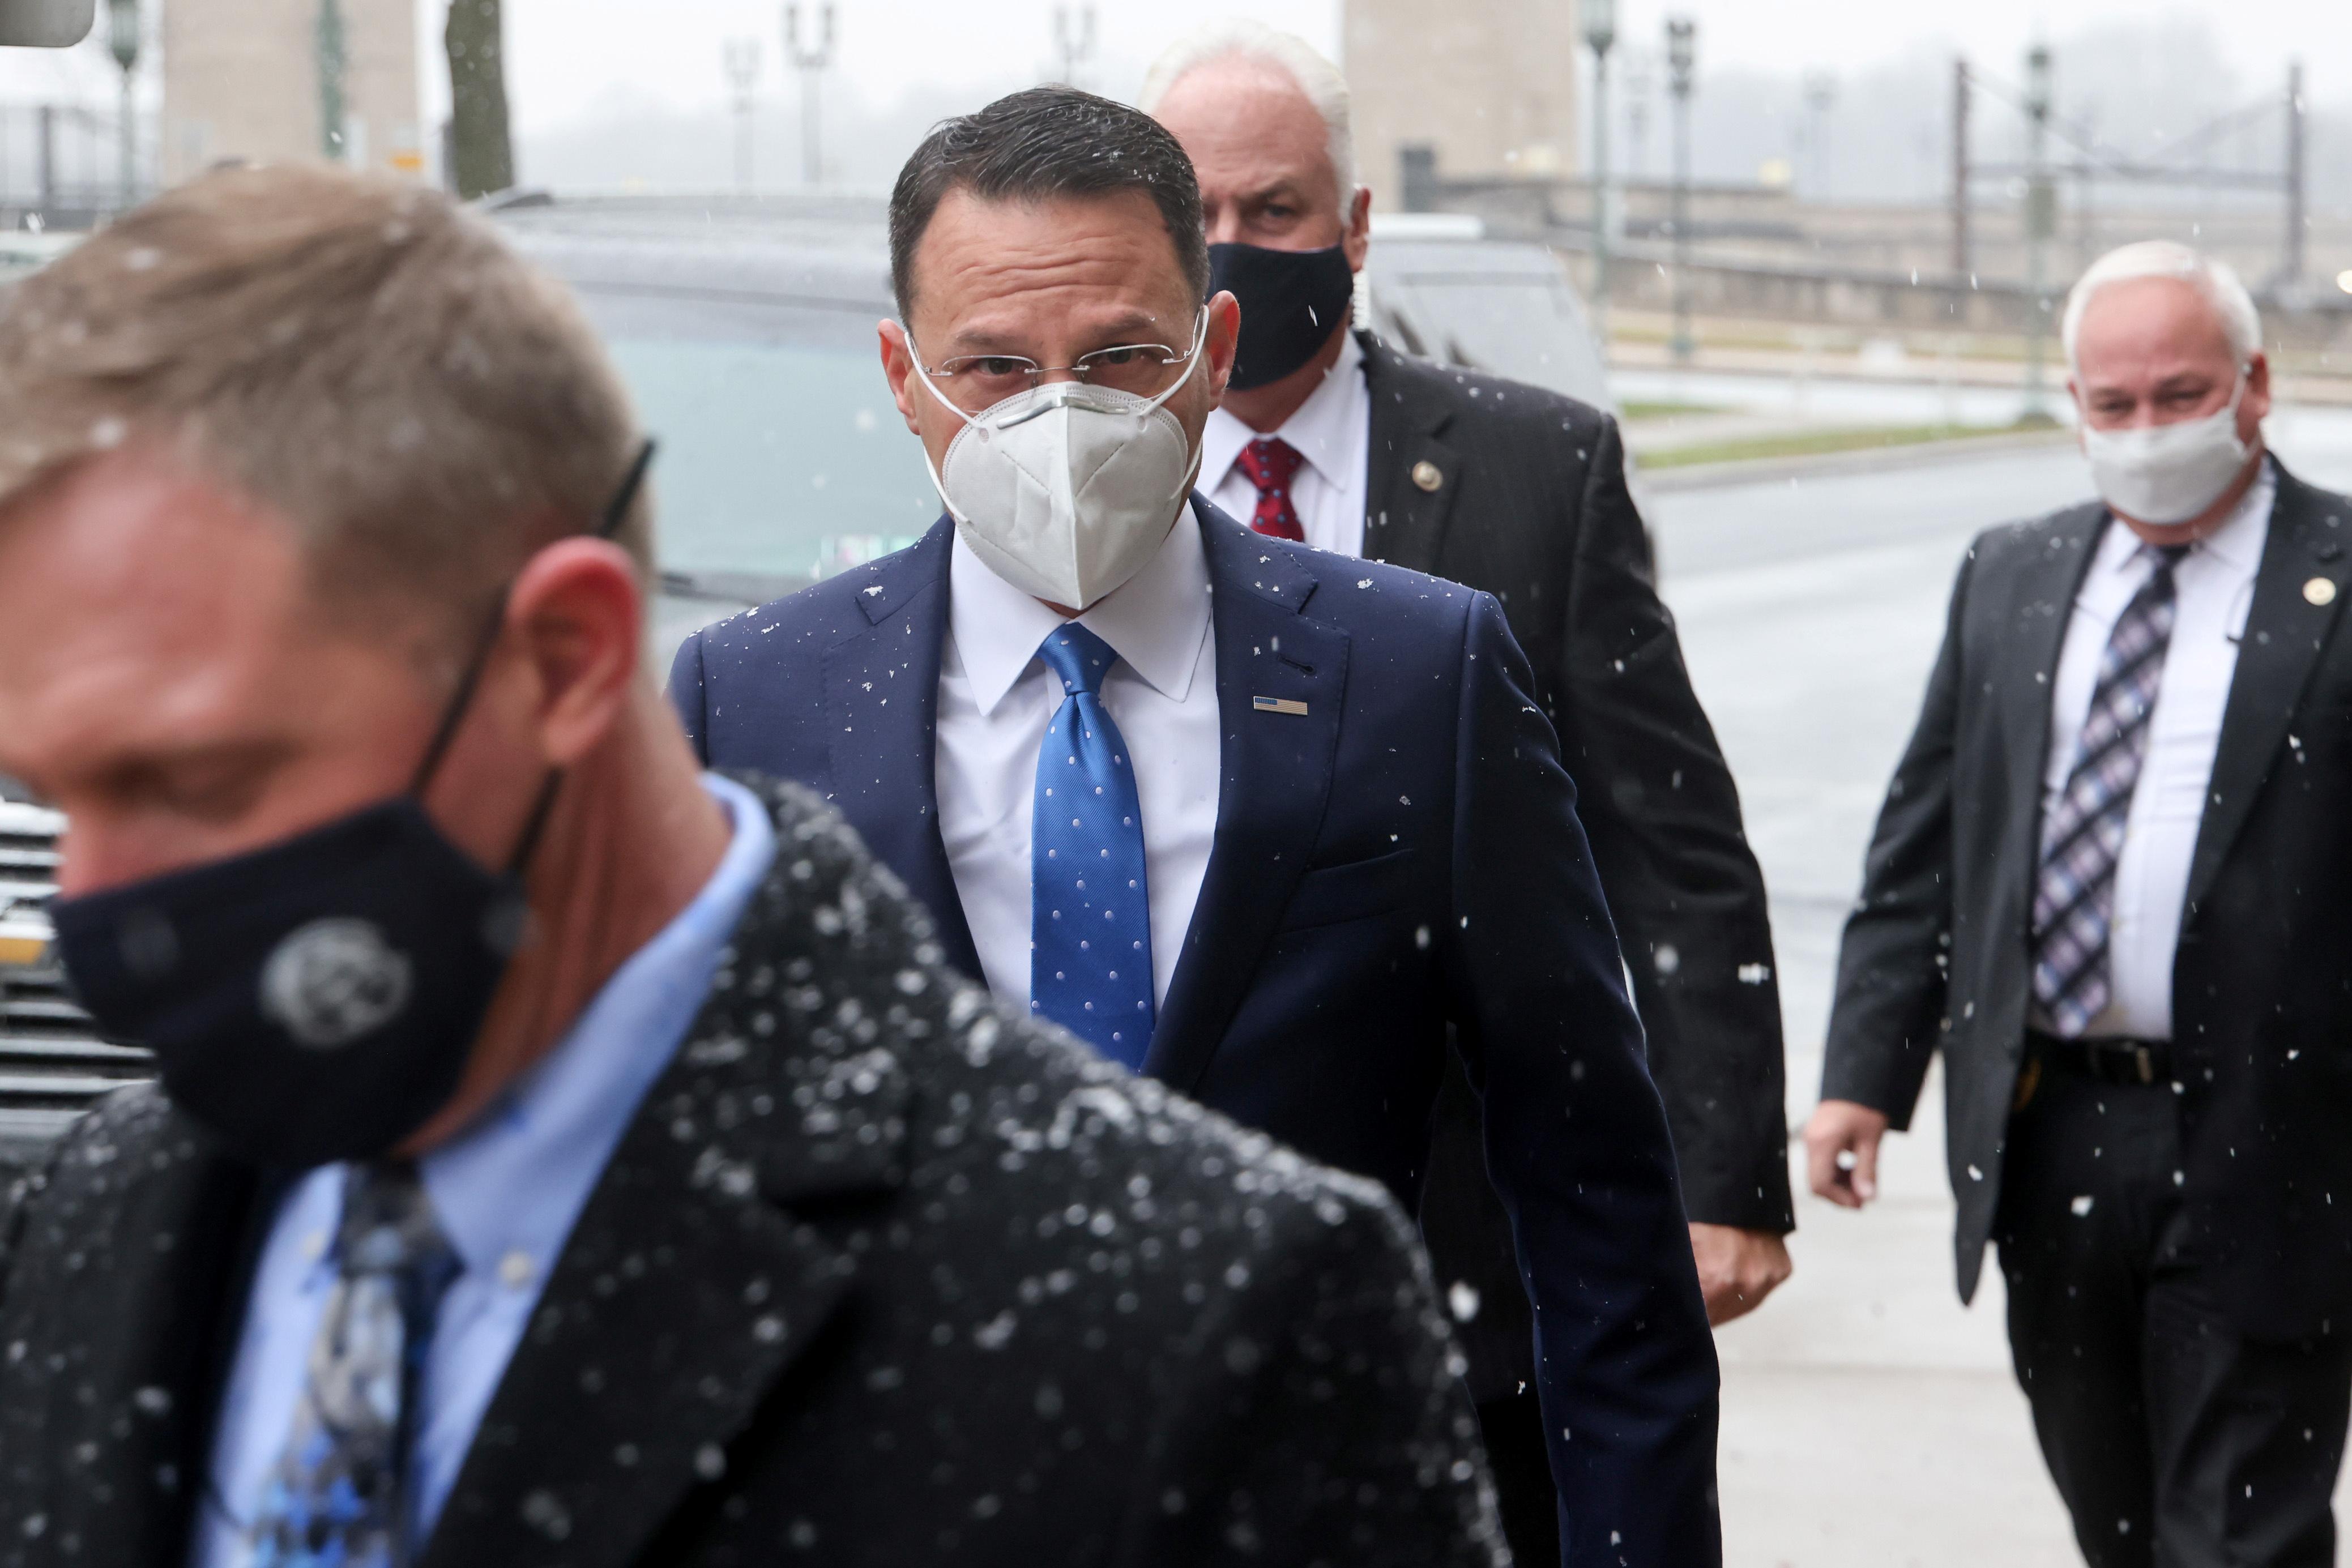 Pennsylvania Attorney General Josh Shapiro arrives at the state capitol complex in Harrisburg, Pennsylvania, U.S. December 14, 2020. REUTERS/Jonathan Ernst